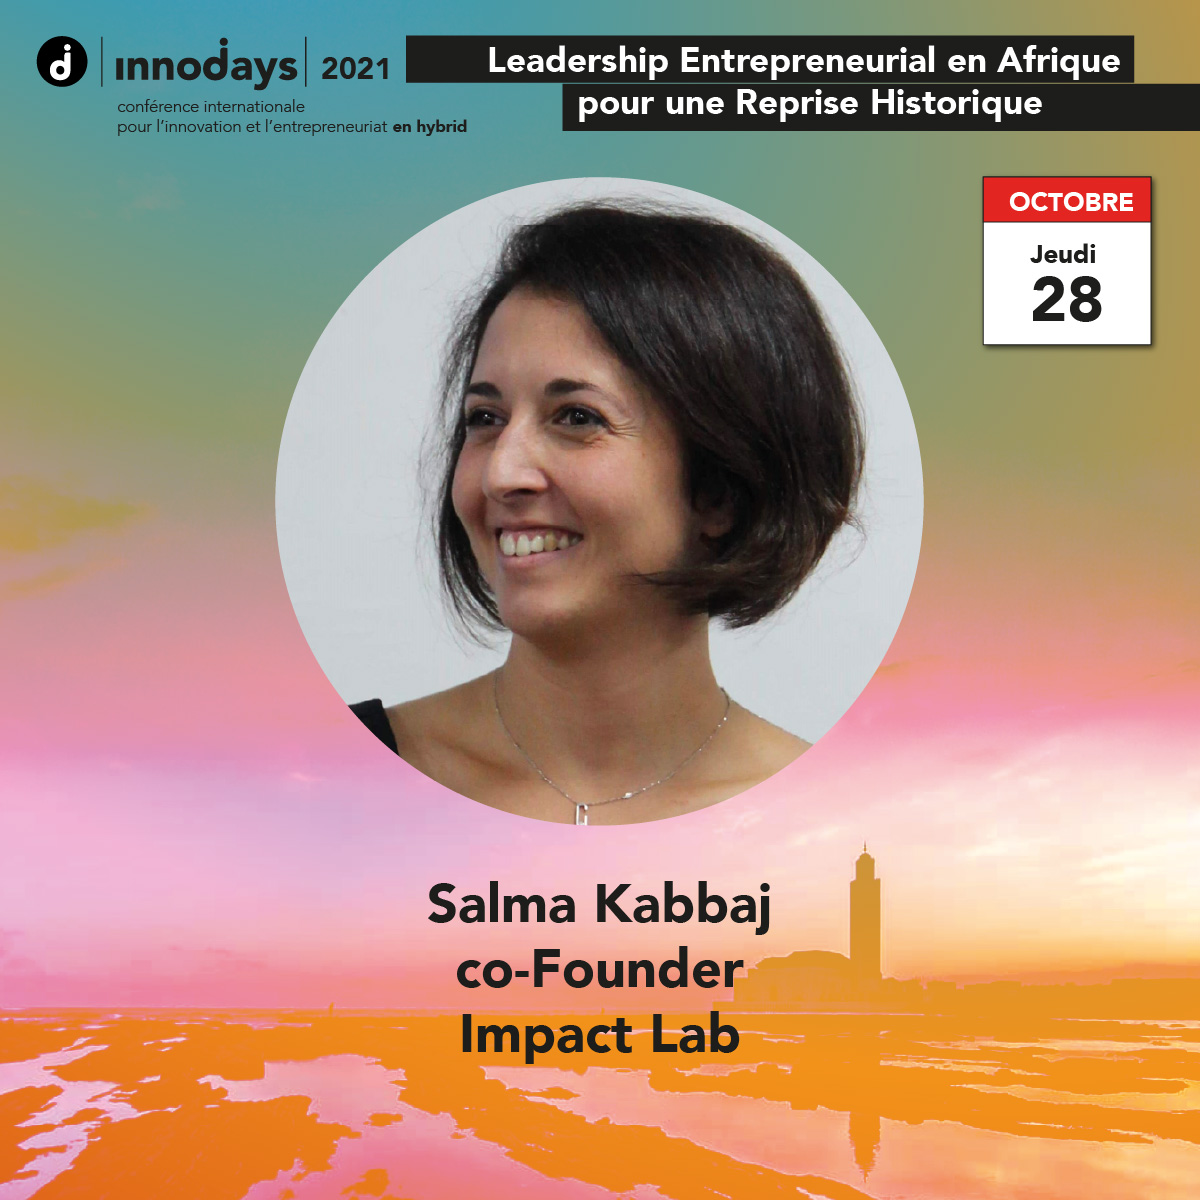 Salma Kabbaj - co-Founder - Impact Lab